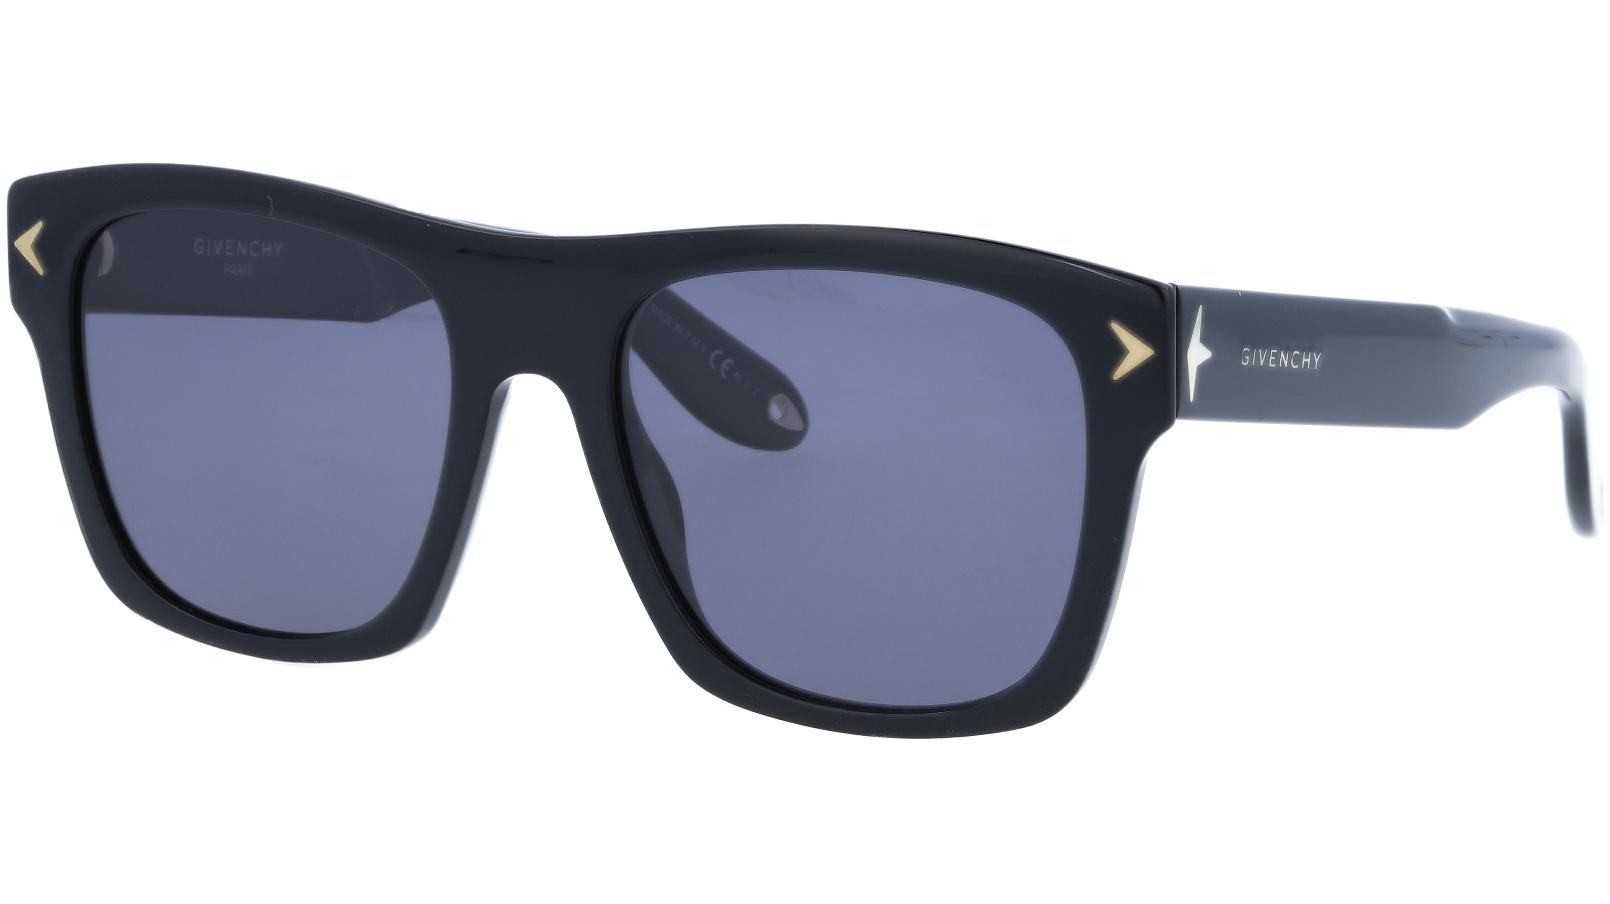 Givenchy GV7011S 807TD 55 Black Sunglasses